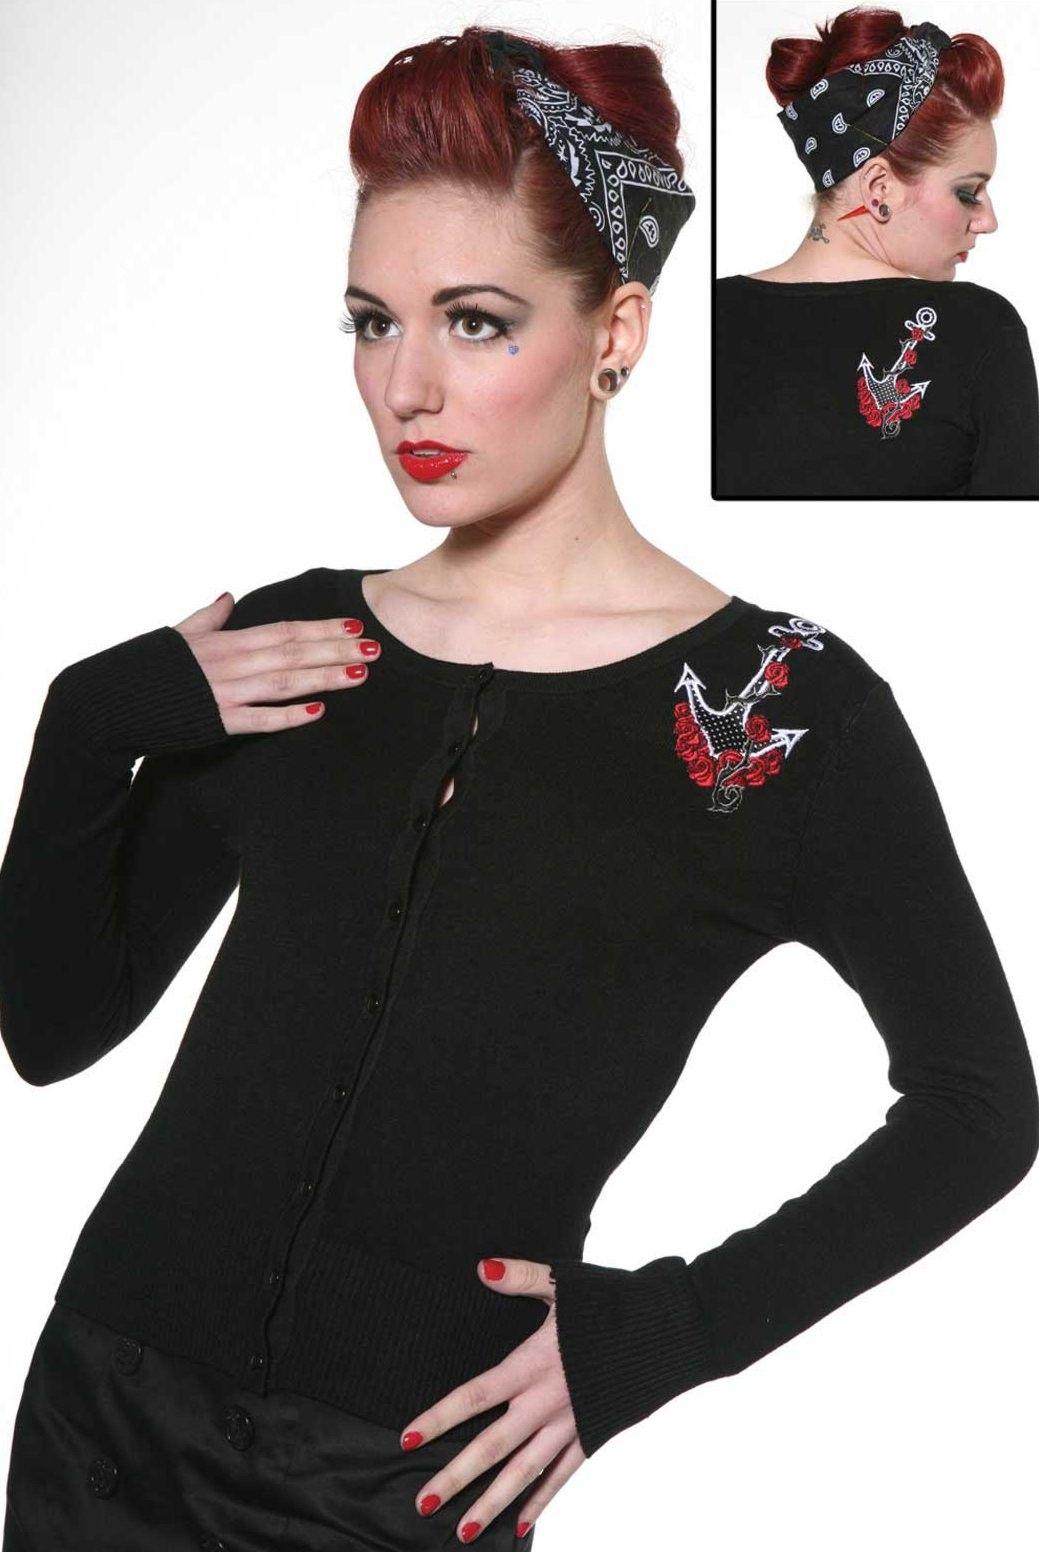 rockabilly clothes | rockabilly pin up clothing | robe